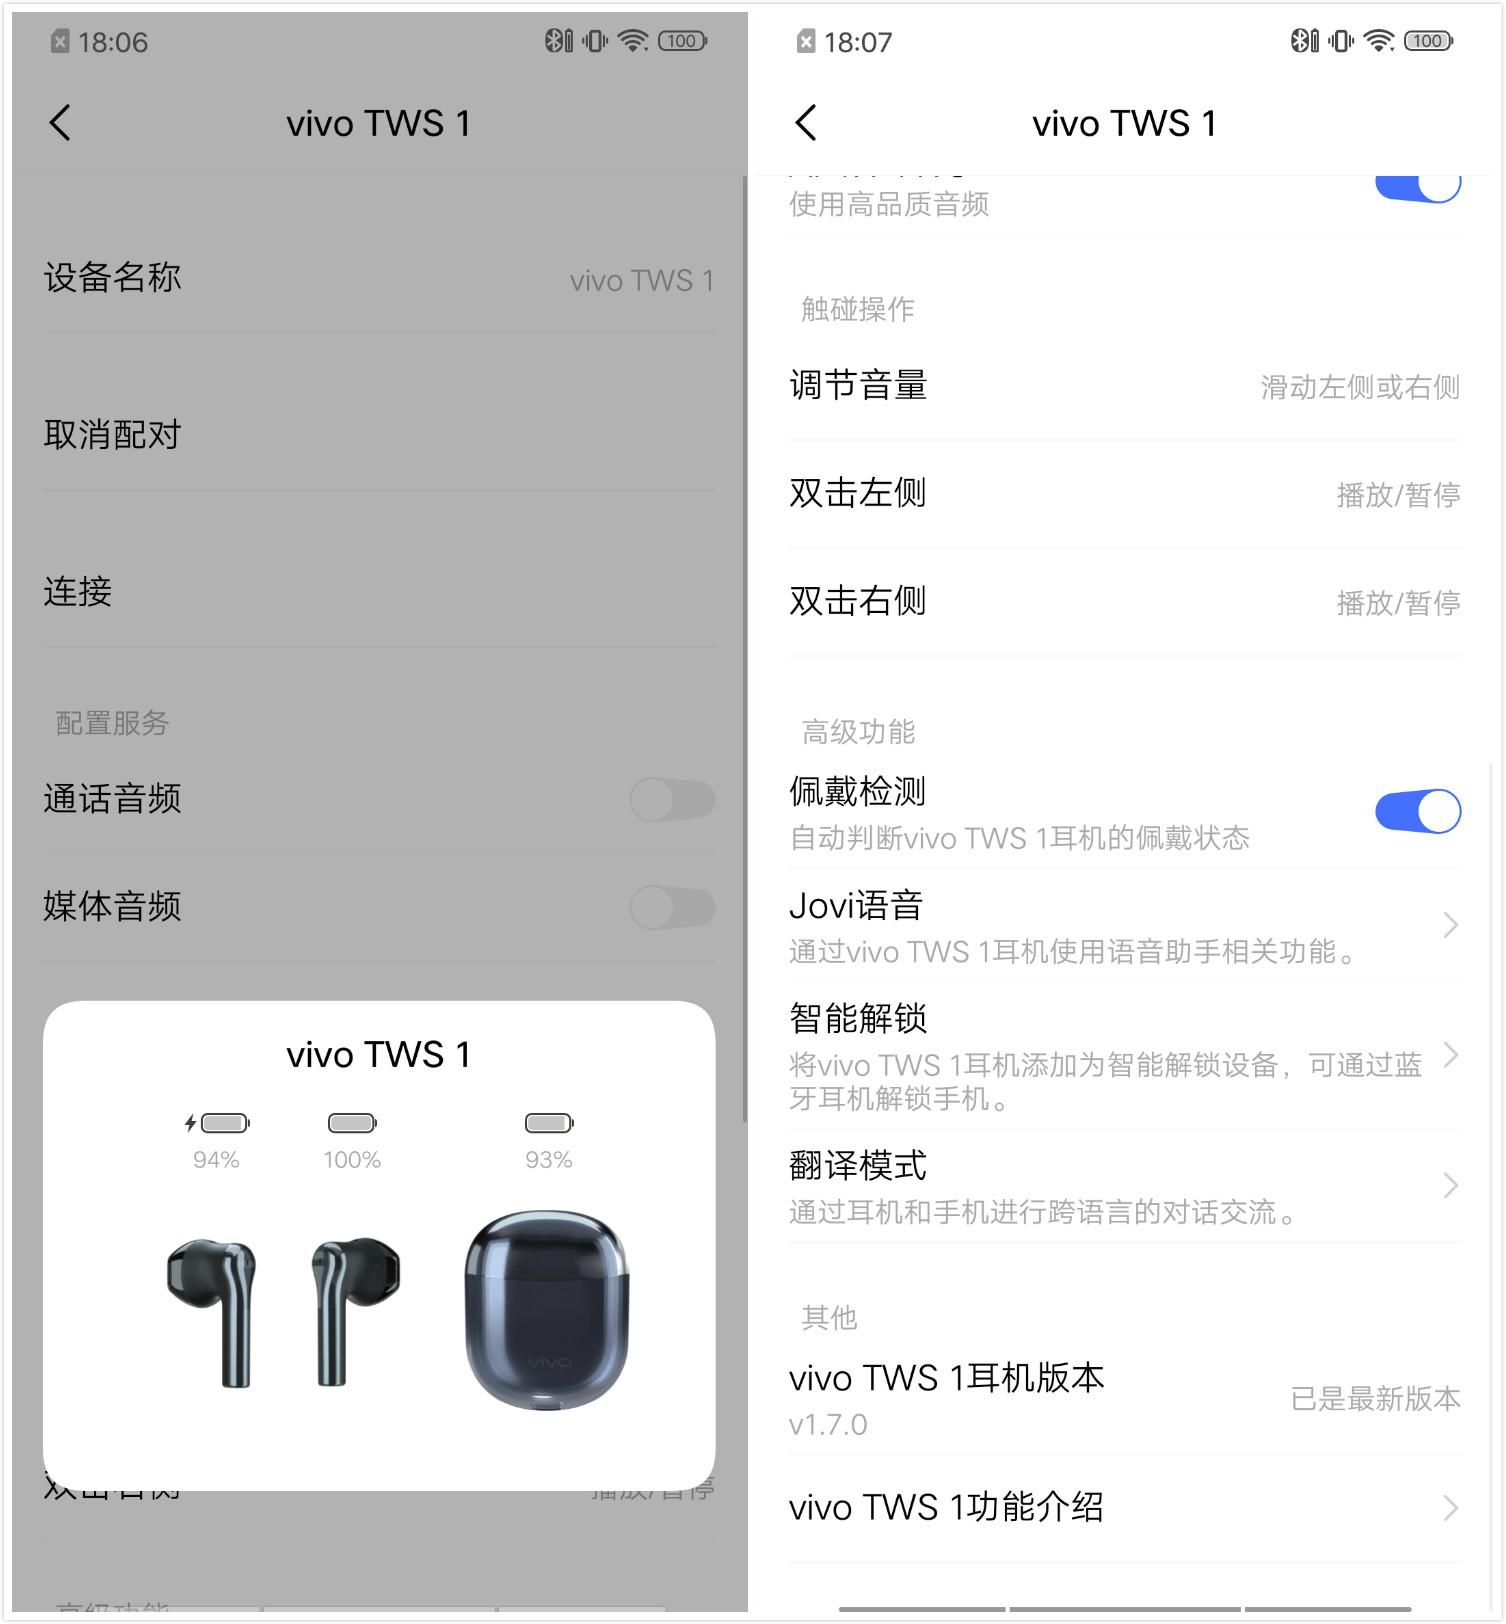 vivo TWS1真无线蓝牙耳机体验:可能是AirPod之外的最佳选择